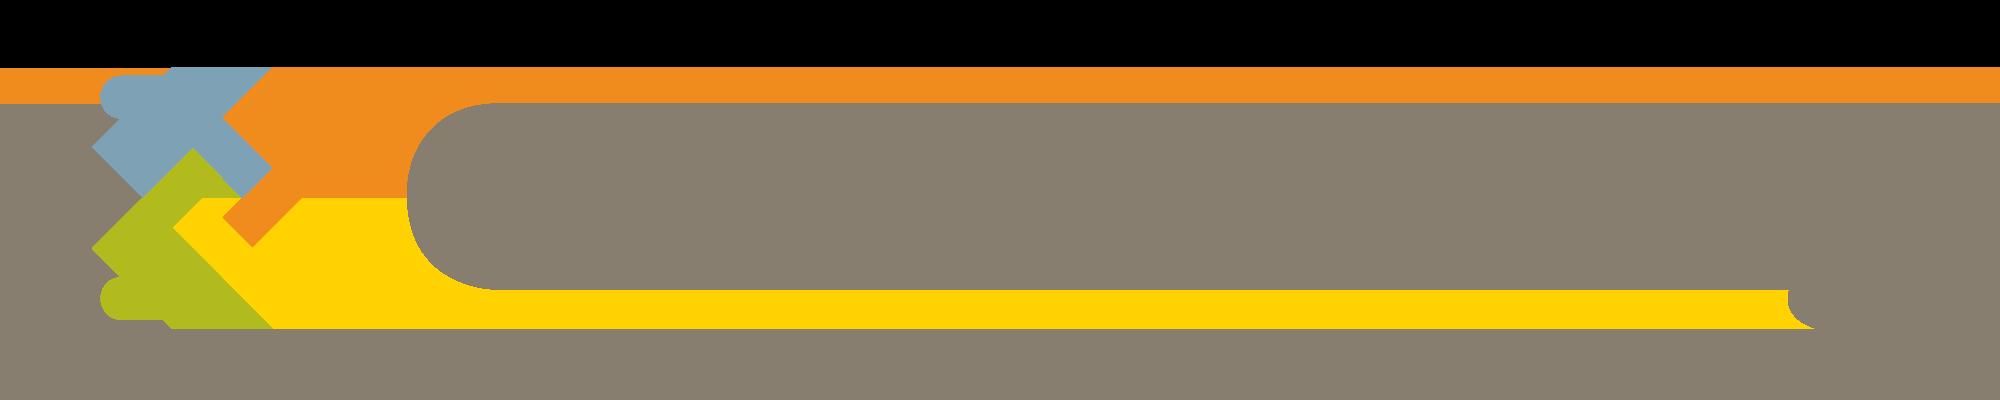 GG2019_Logo_horizontal_4color